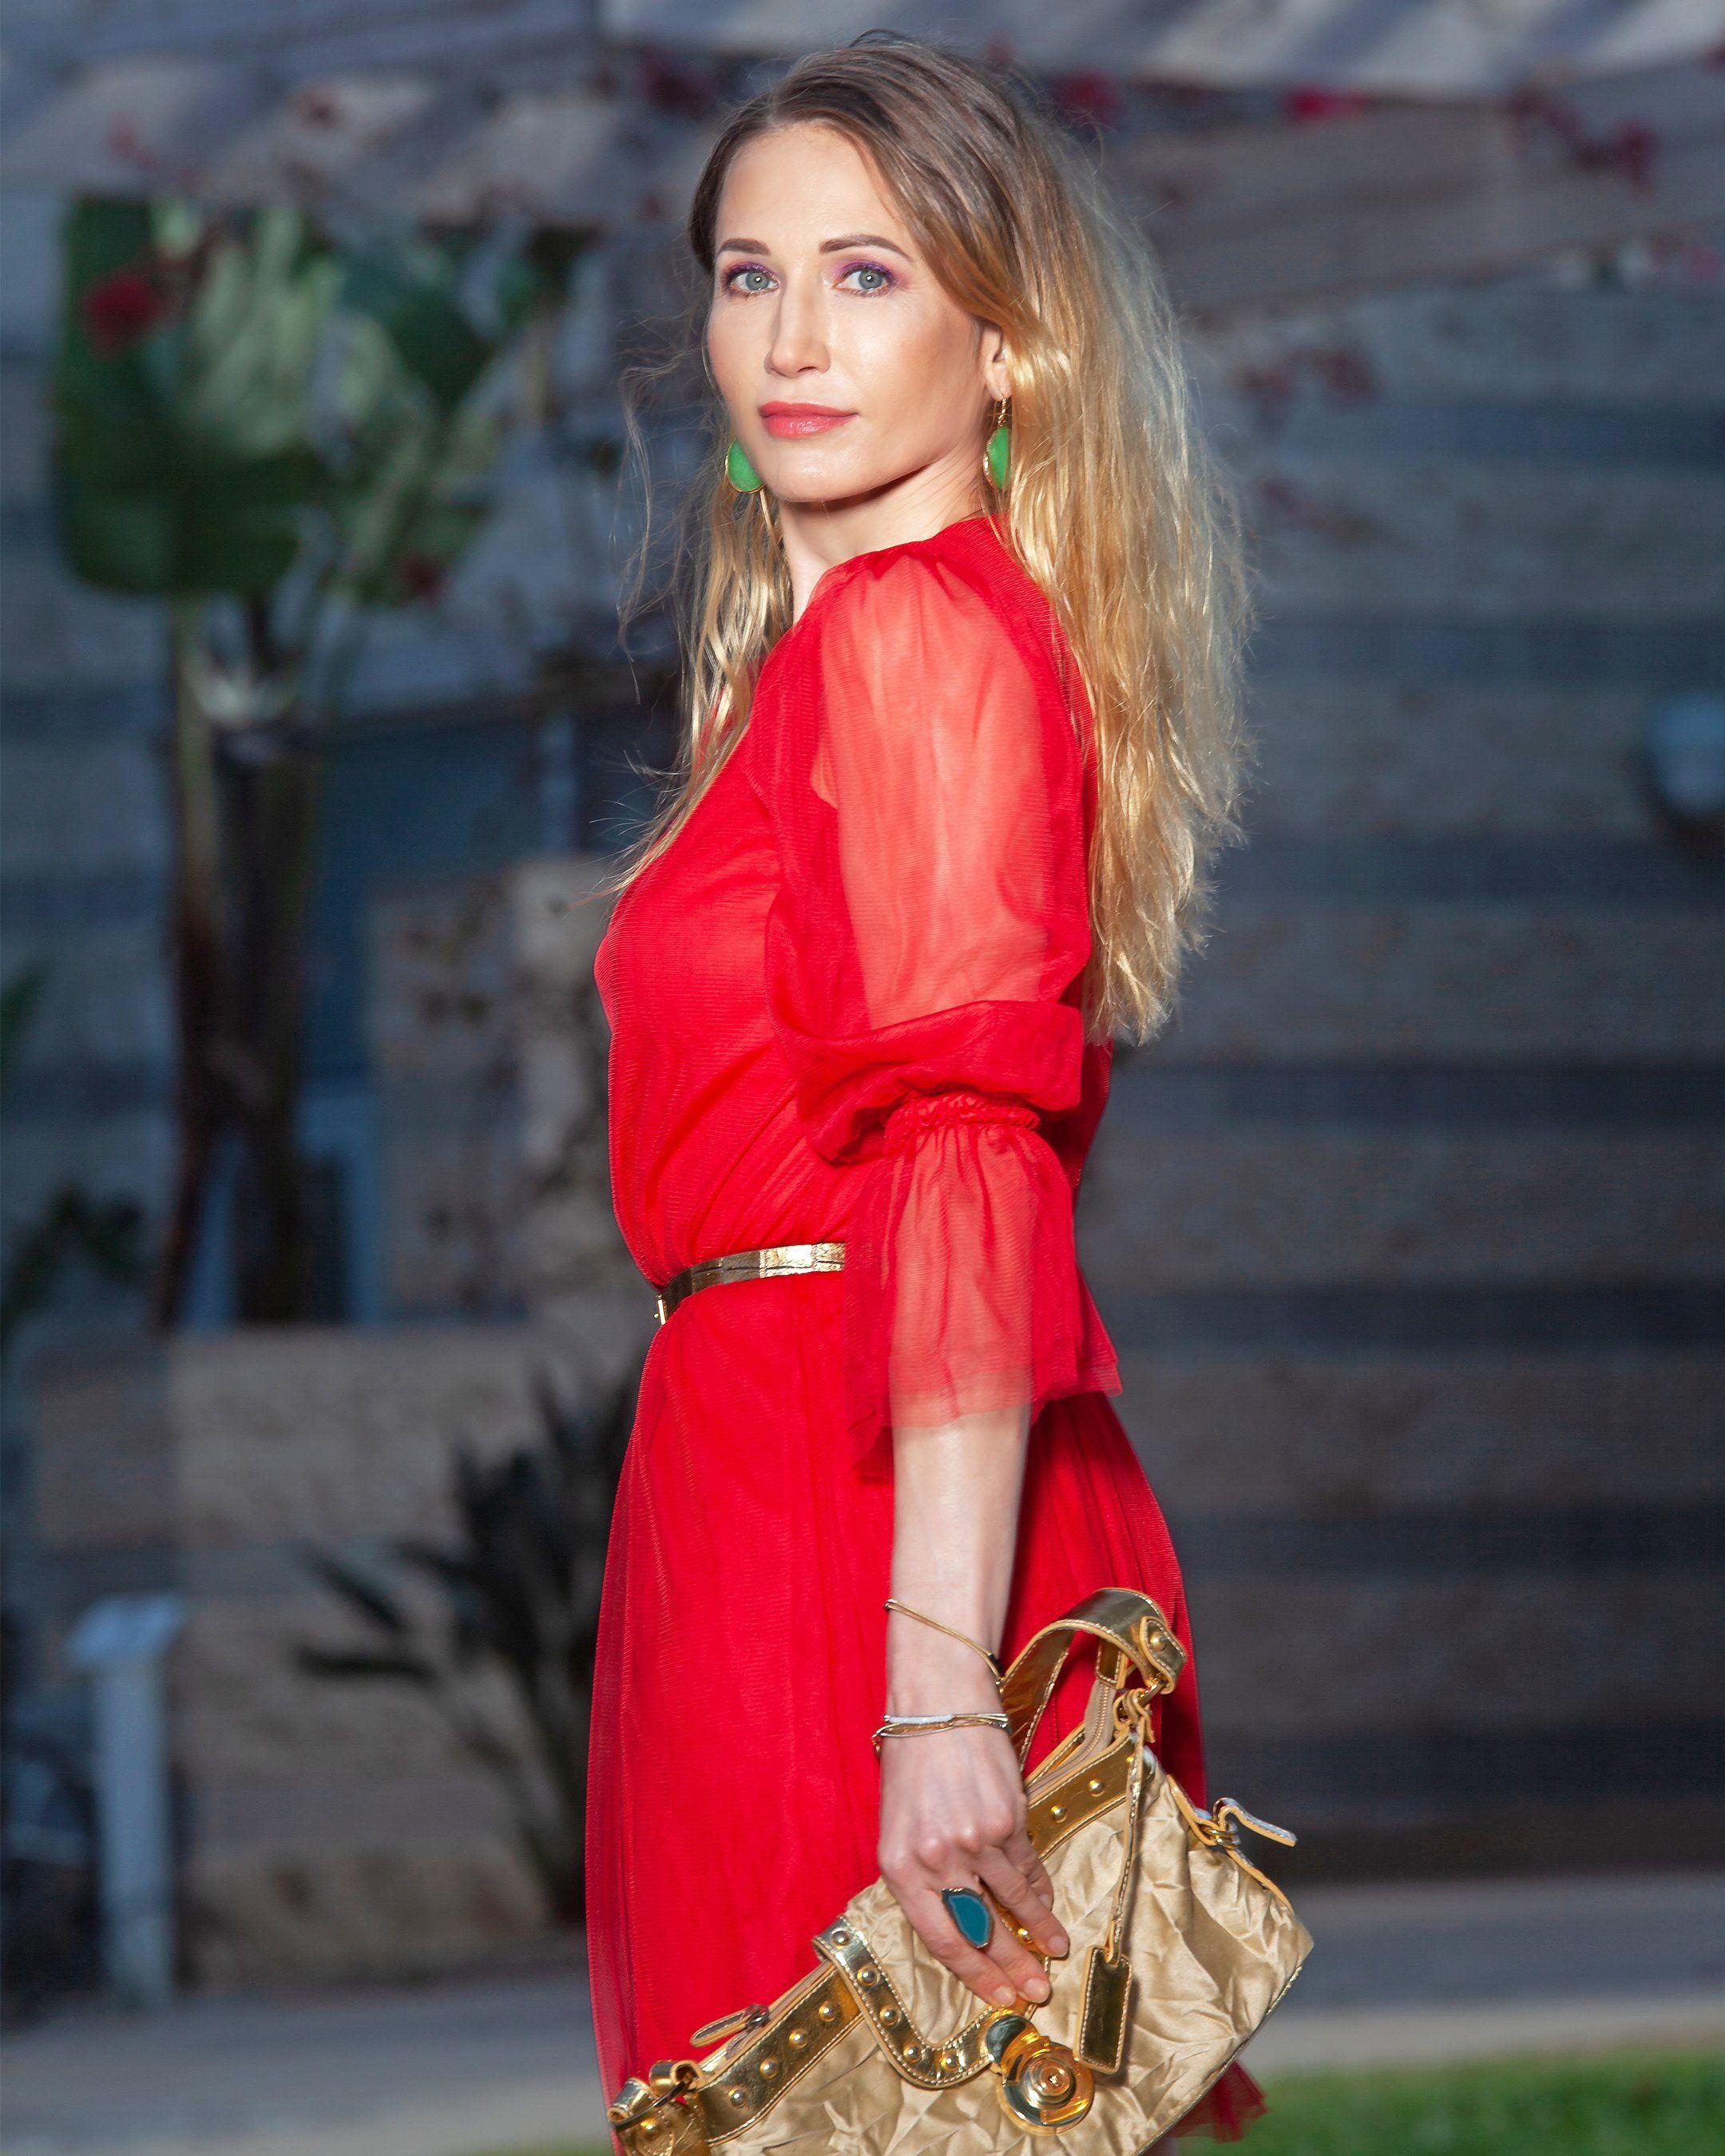 Staud Red Beaded Cuff Tulle Mesh Long Sleeves Dress Long Sleeve Dress Long Sleeve Mesh Dress Mesh Long Sleeve